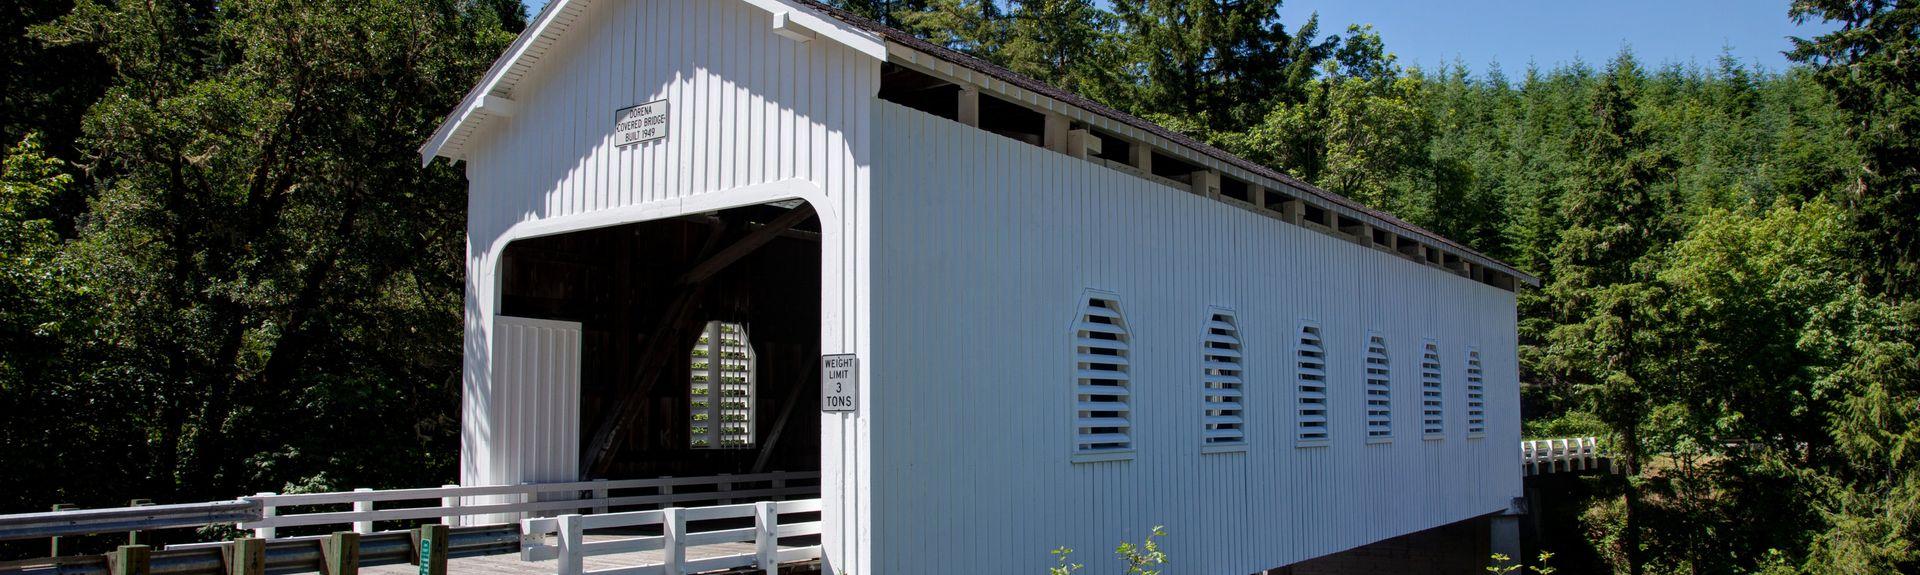 Cottage Grove, Oregon, United States of America